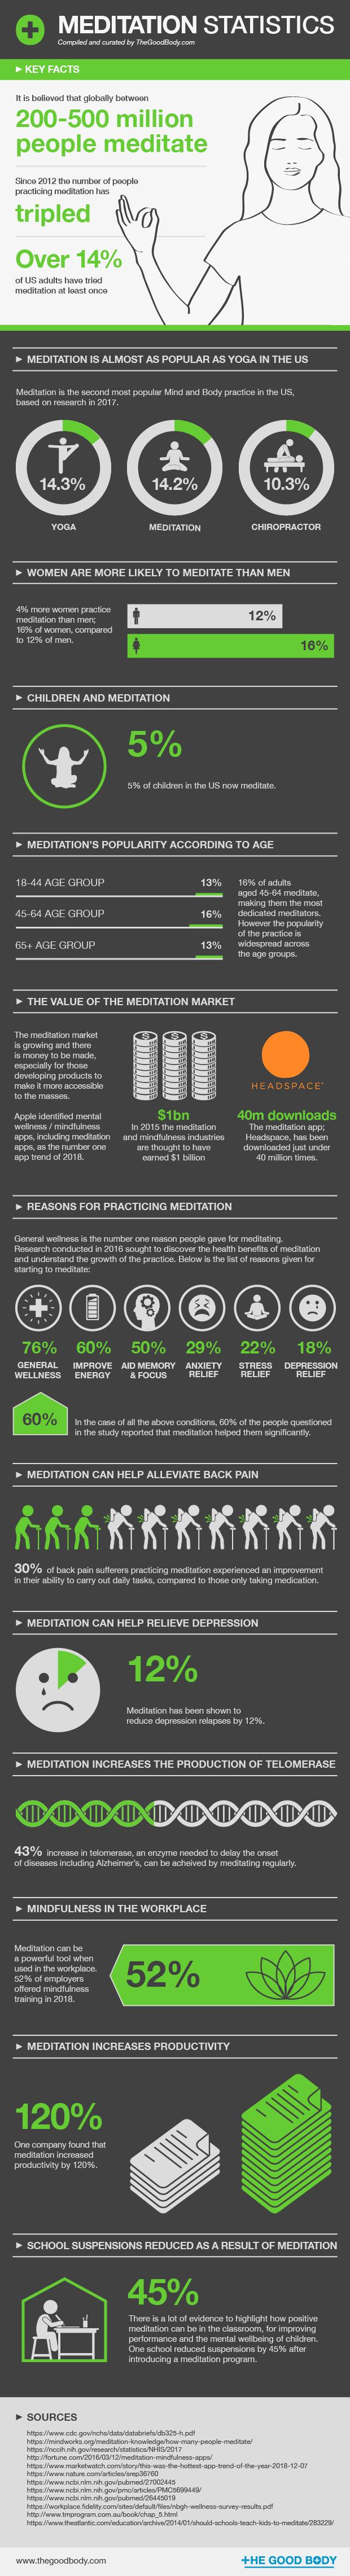 Meditation Statistics – infographic